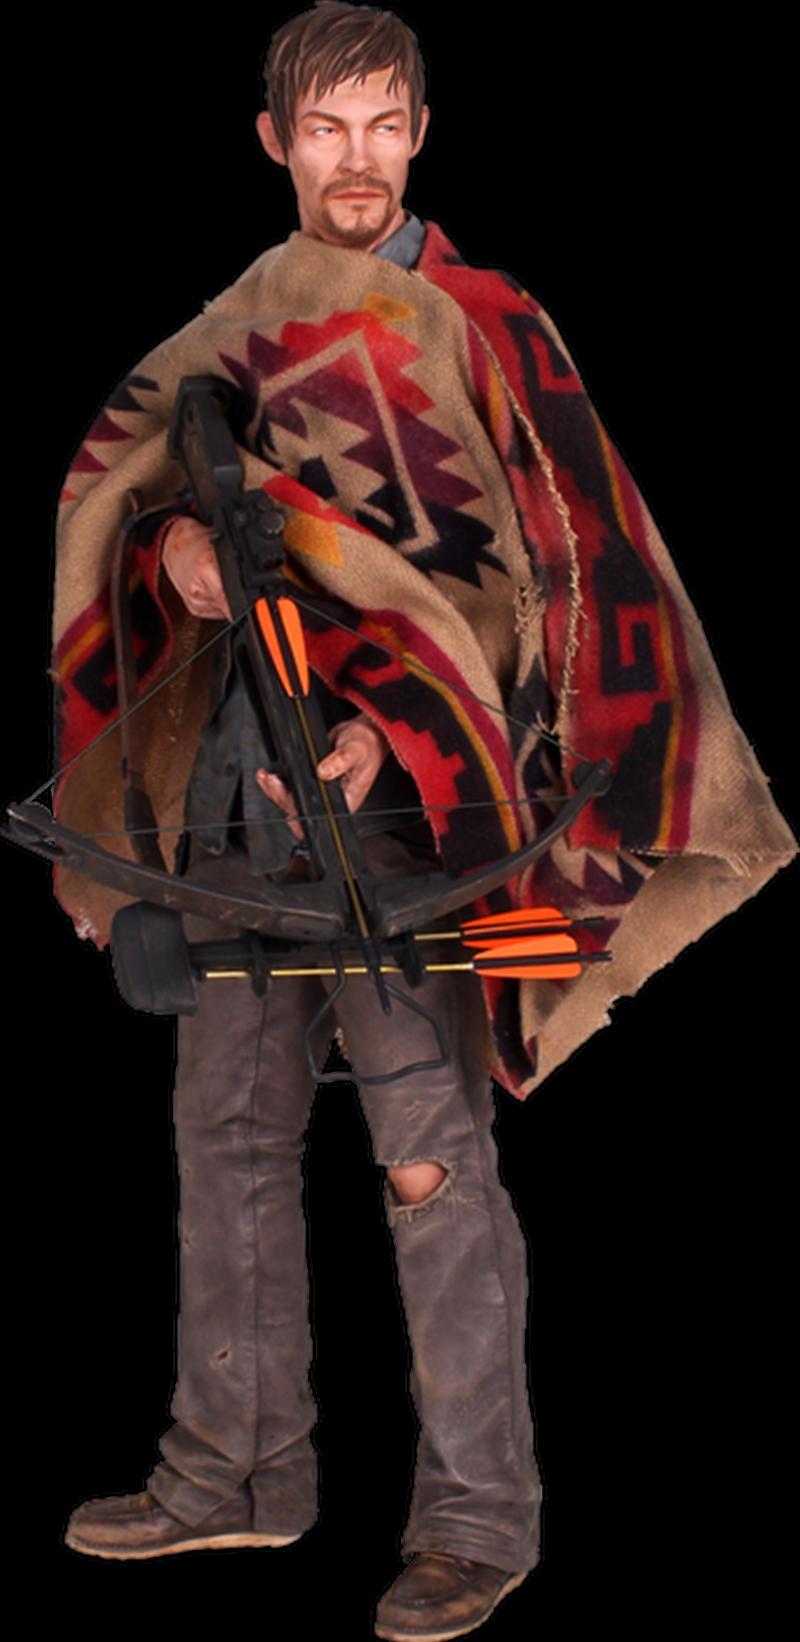 The Walking Dead - Daryl Dixon 1:4 Scale Statue | Merchandise